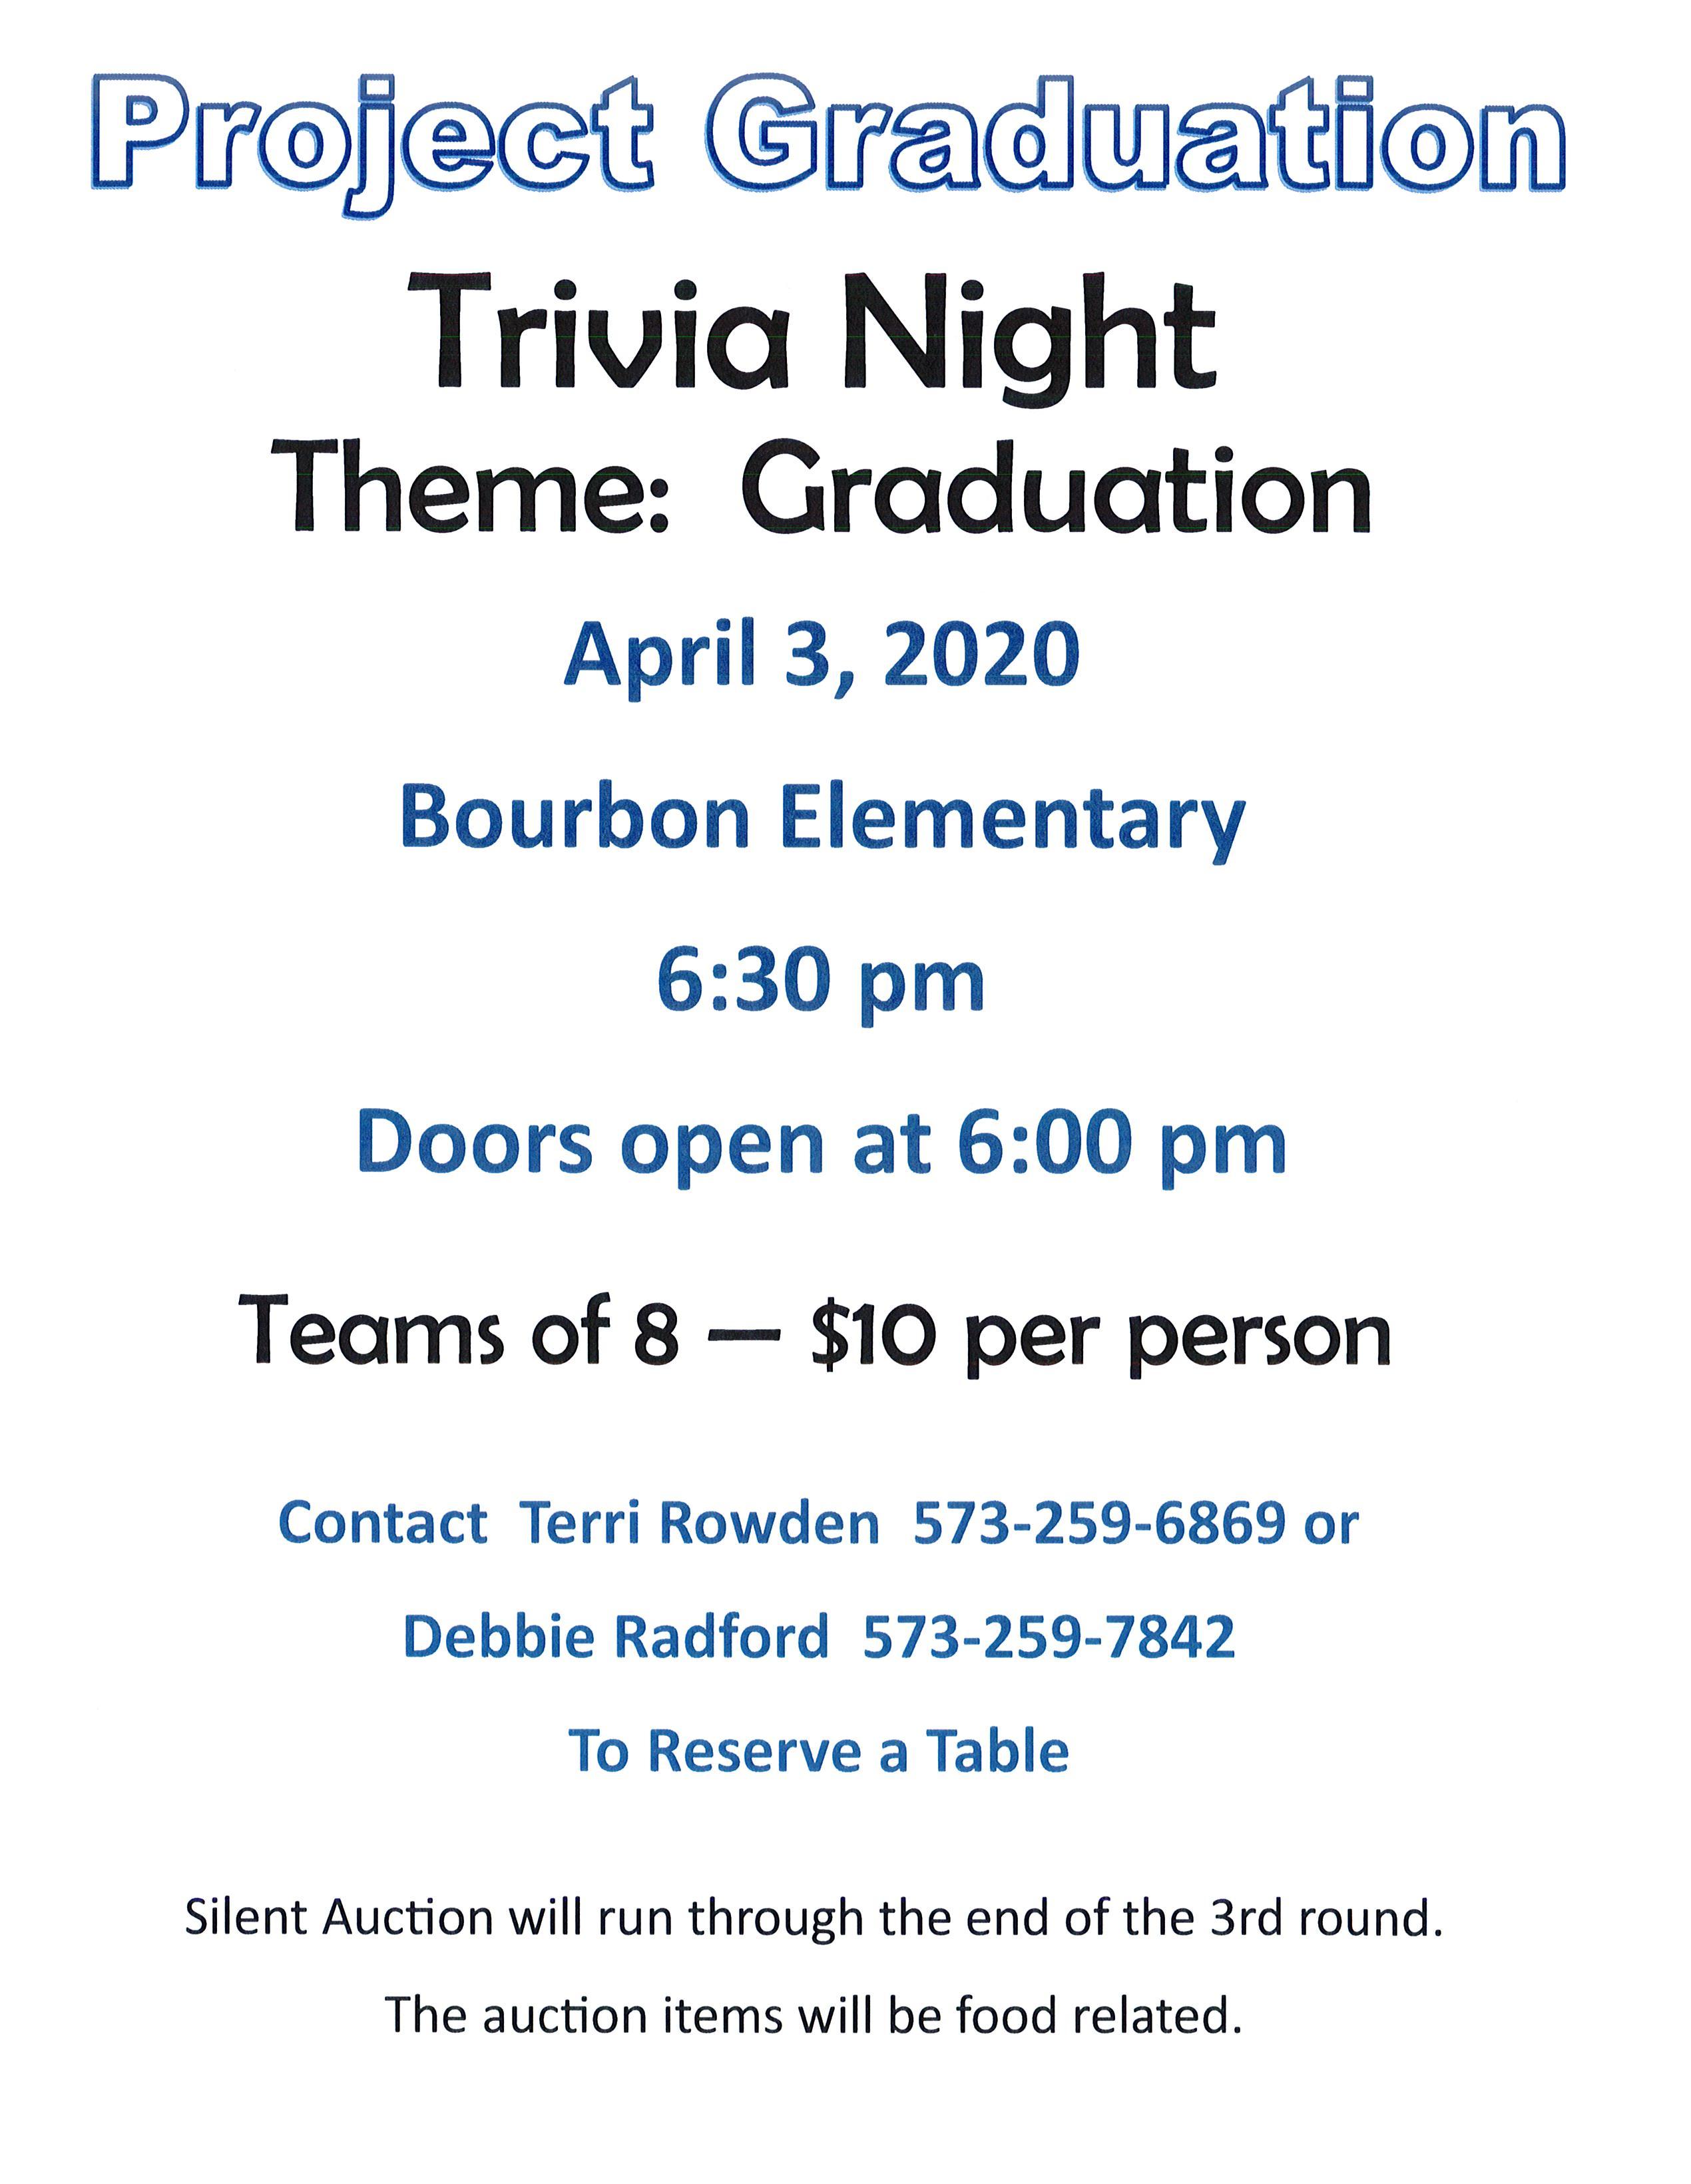 Project Grad -Trivia Night - POSTPONED